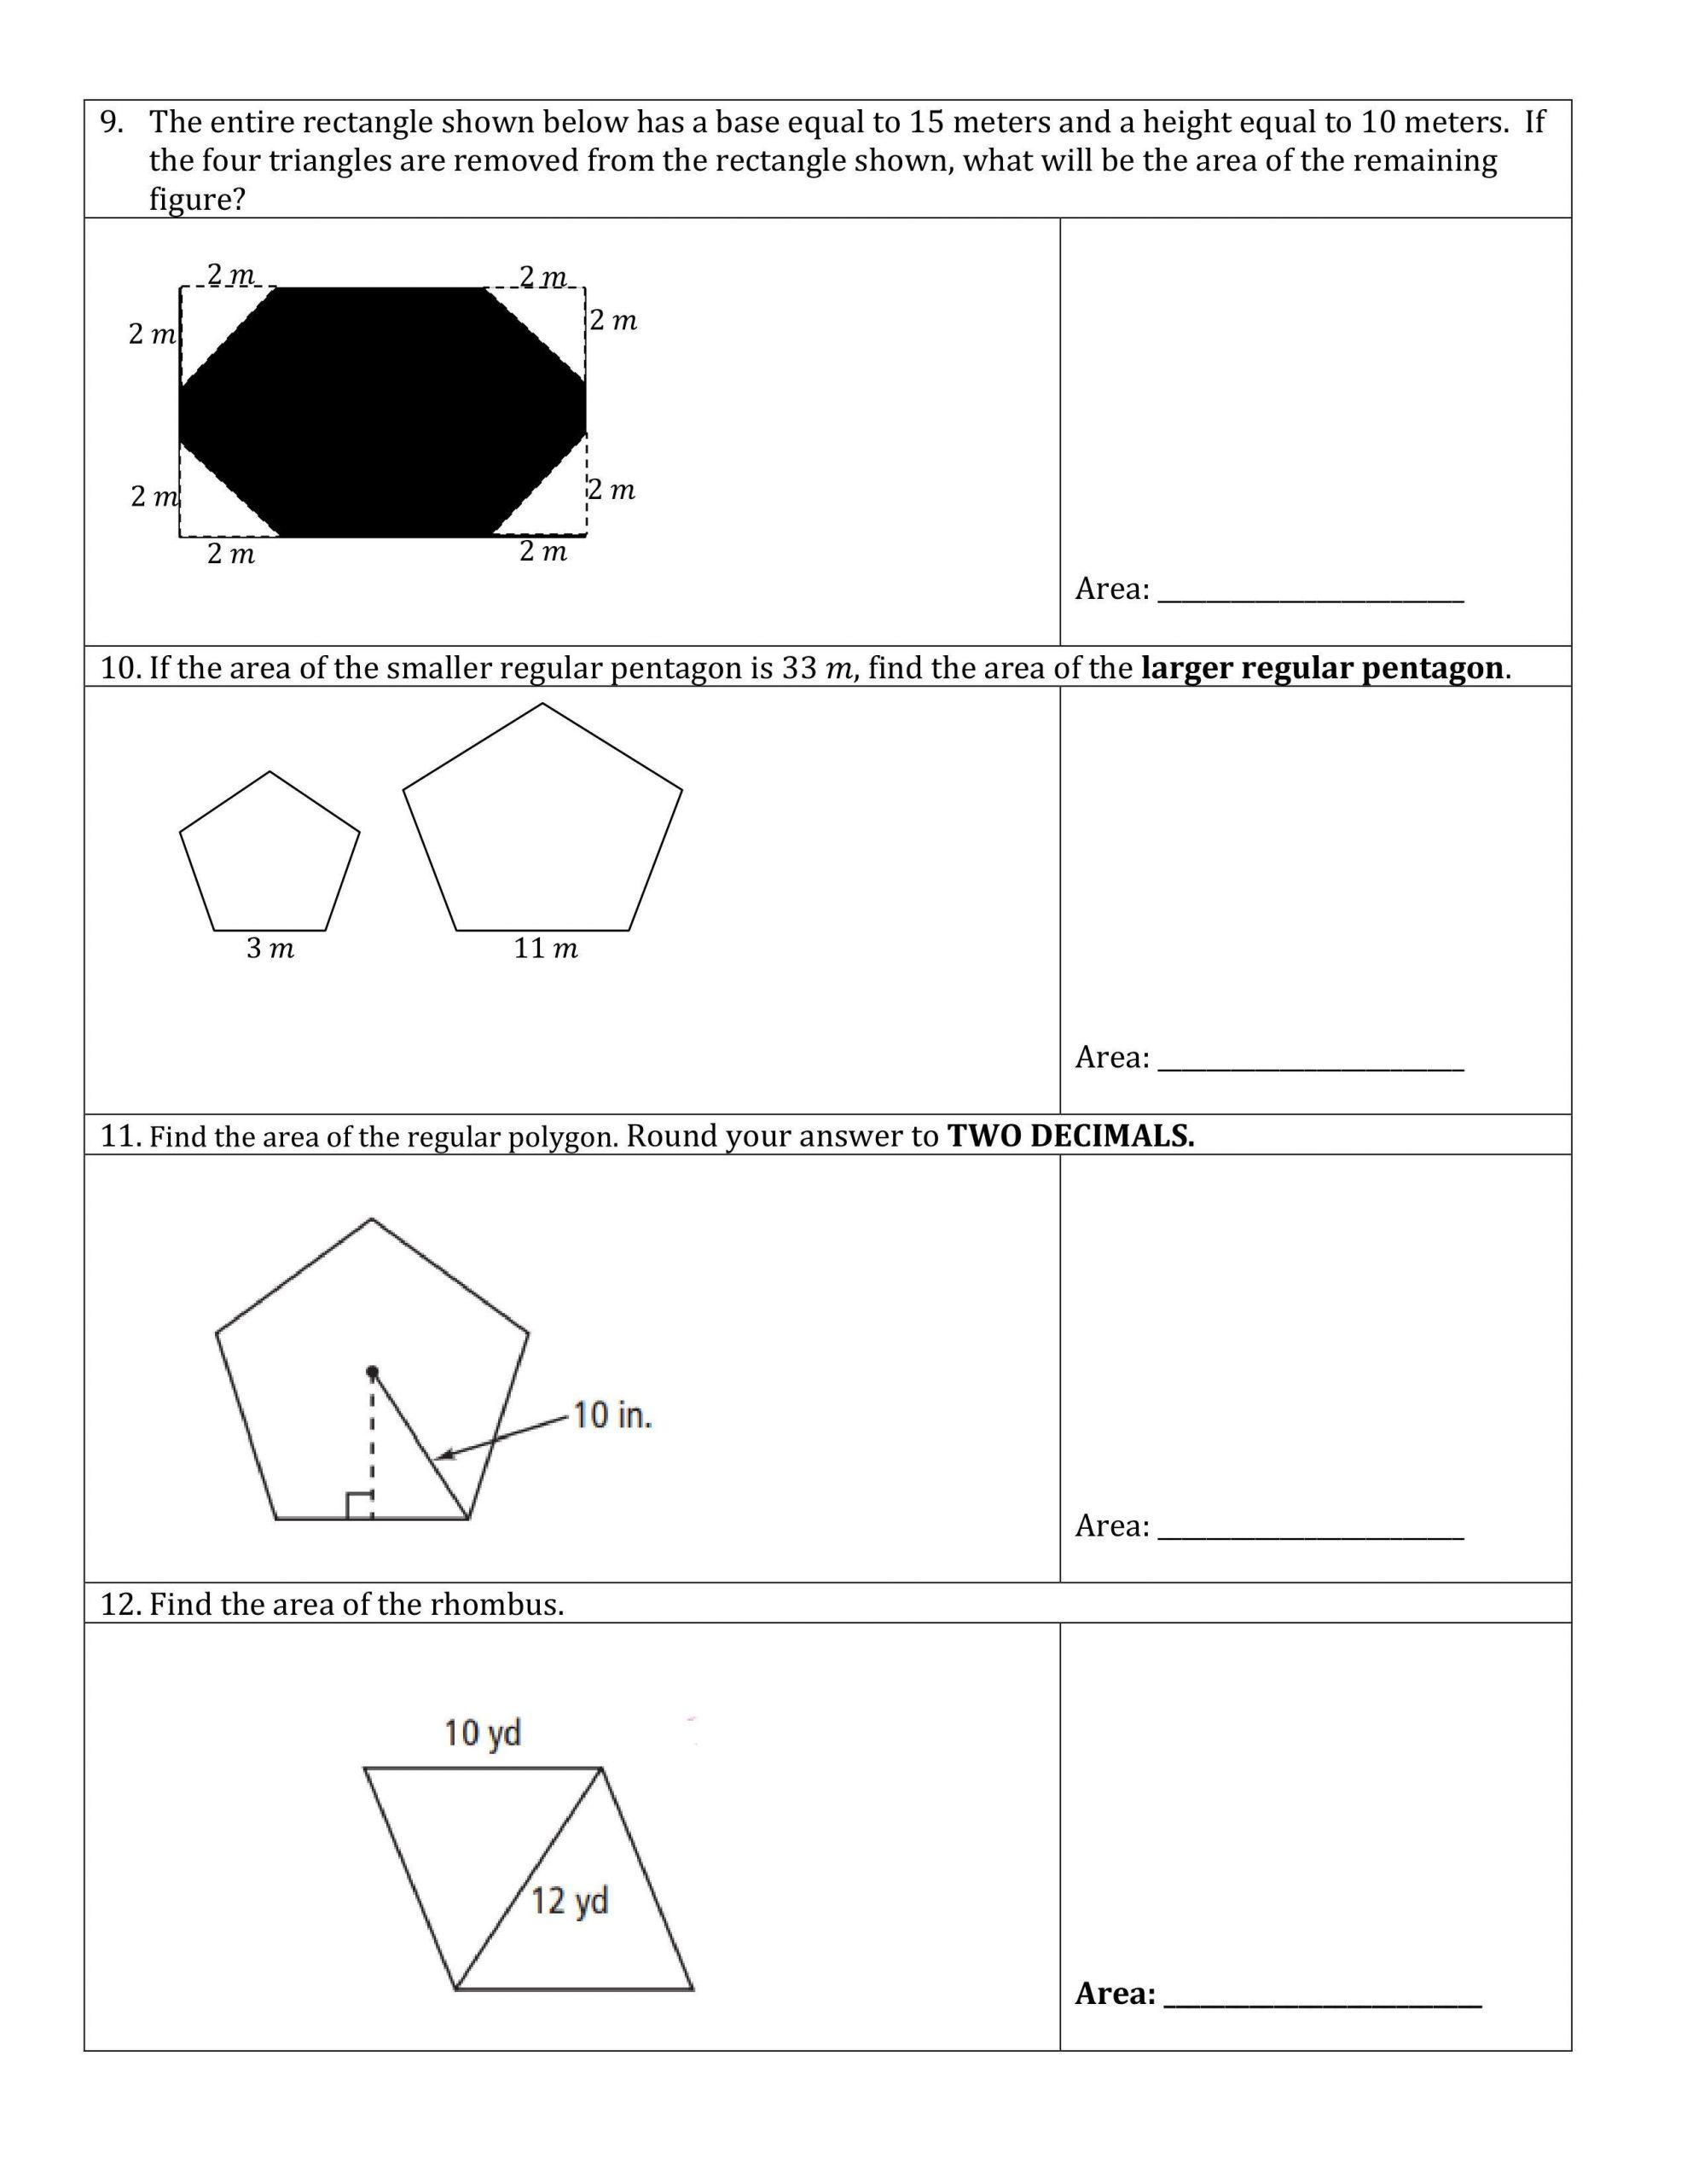 Area Of Rhombus Worksheet 9 In Worksheet 12 Find the area Of the Rhombus Brainly